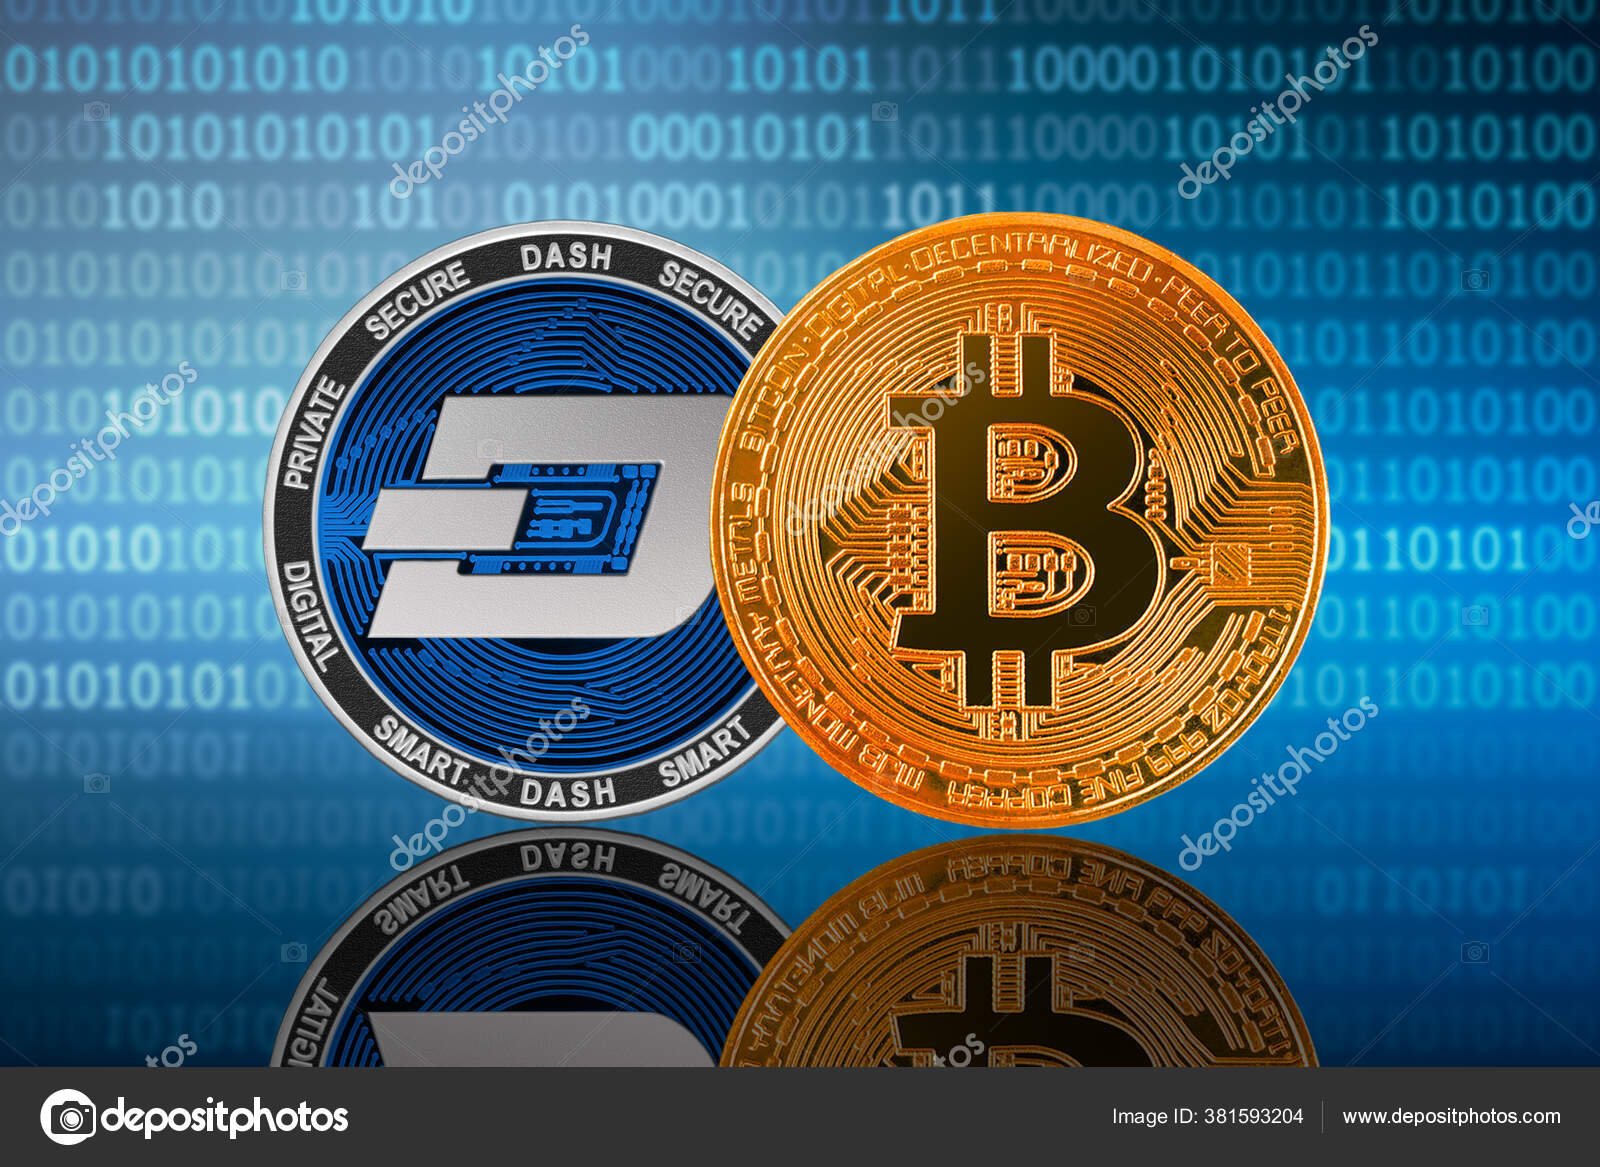 bitcoin vs dash)